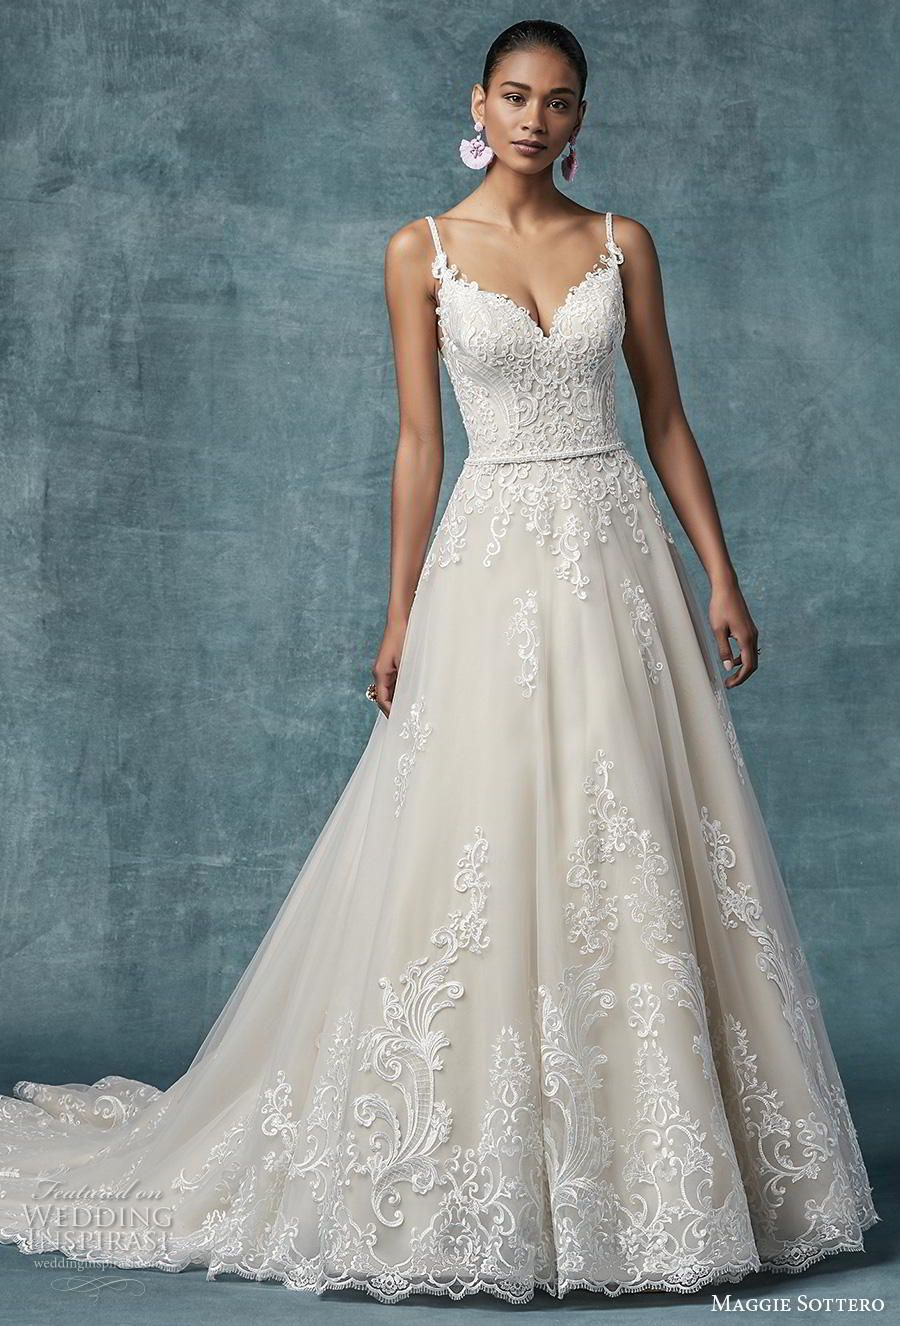 99ad824d73 maggie sottero spring 2019 bridal spaghetti strap sweetheart neckline  heavily embellished bodice hem romantic a line